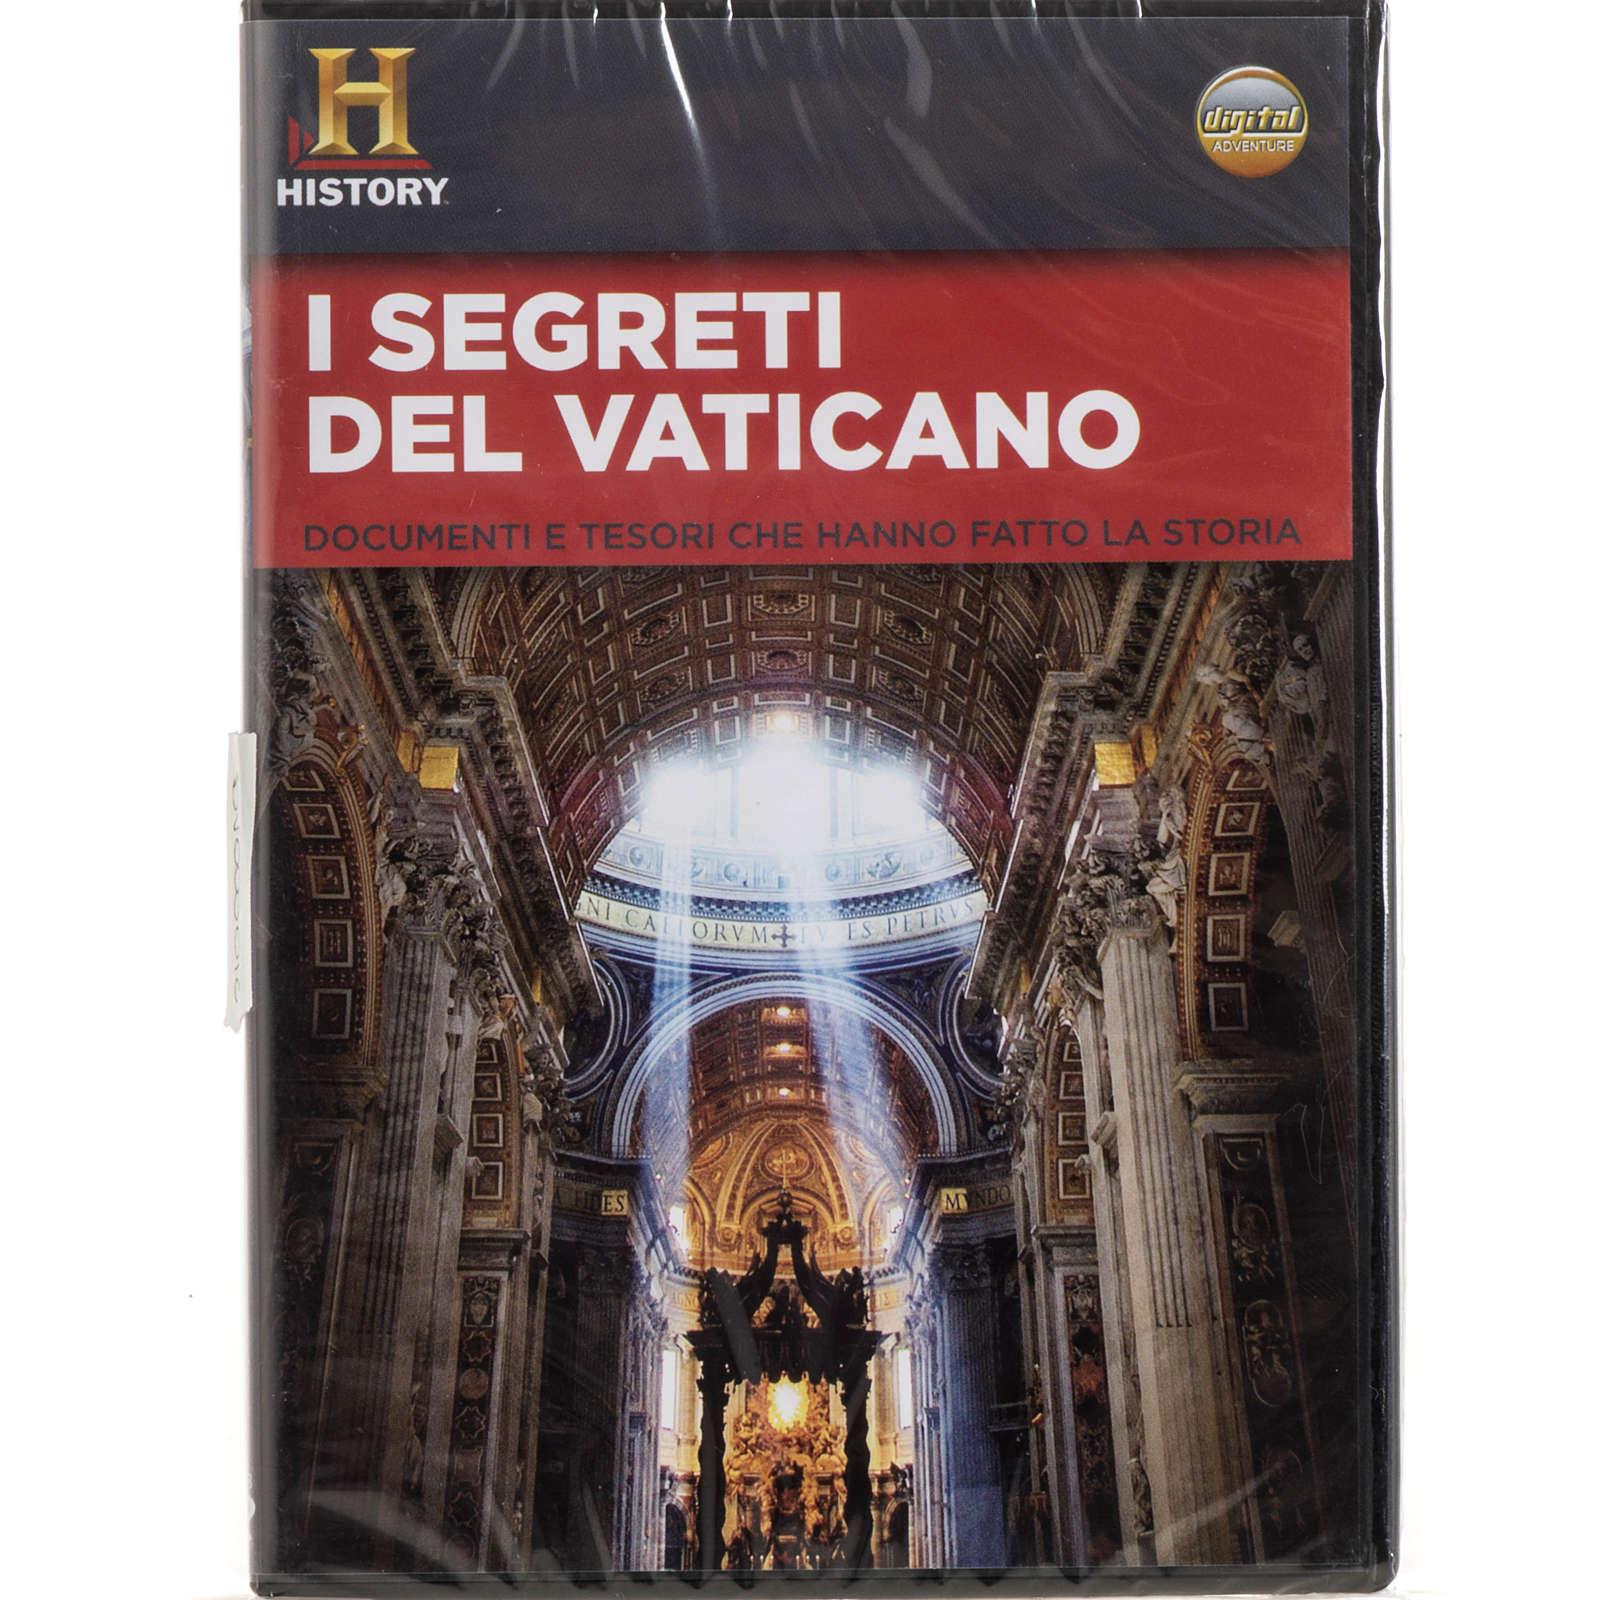 The secrets of the Vatican 3